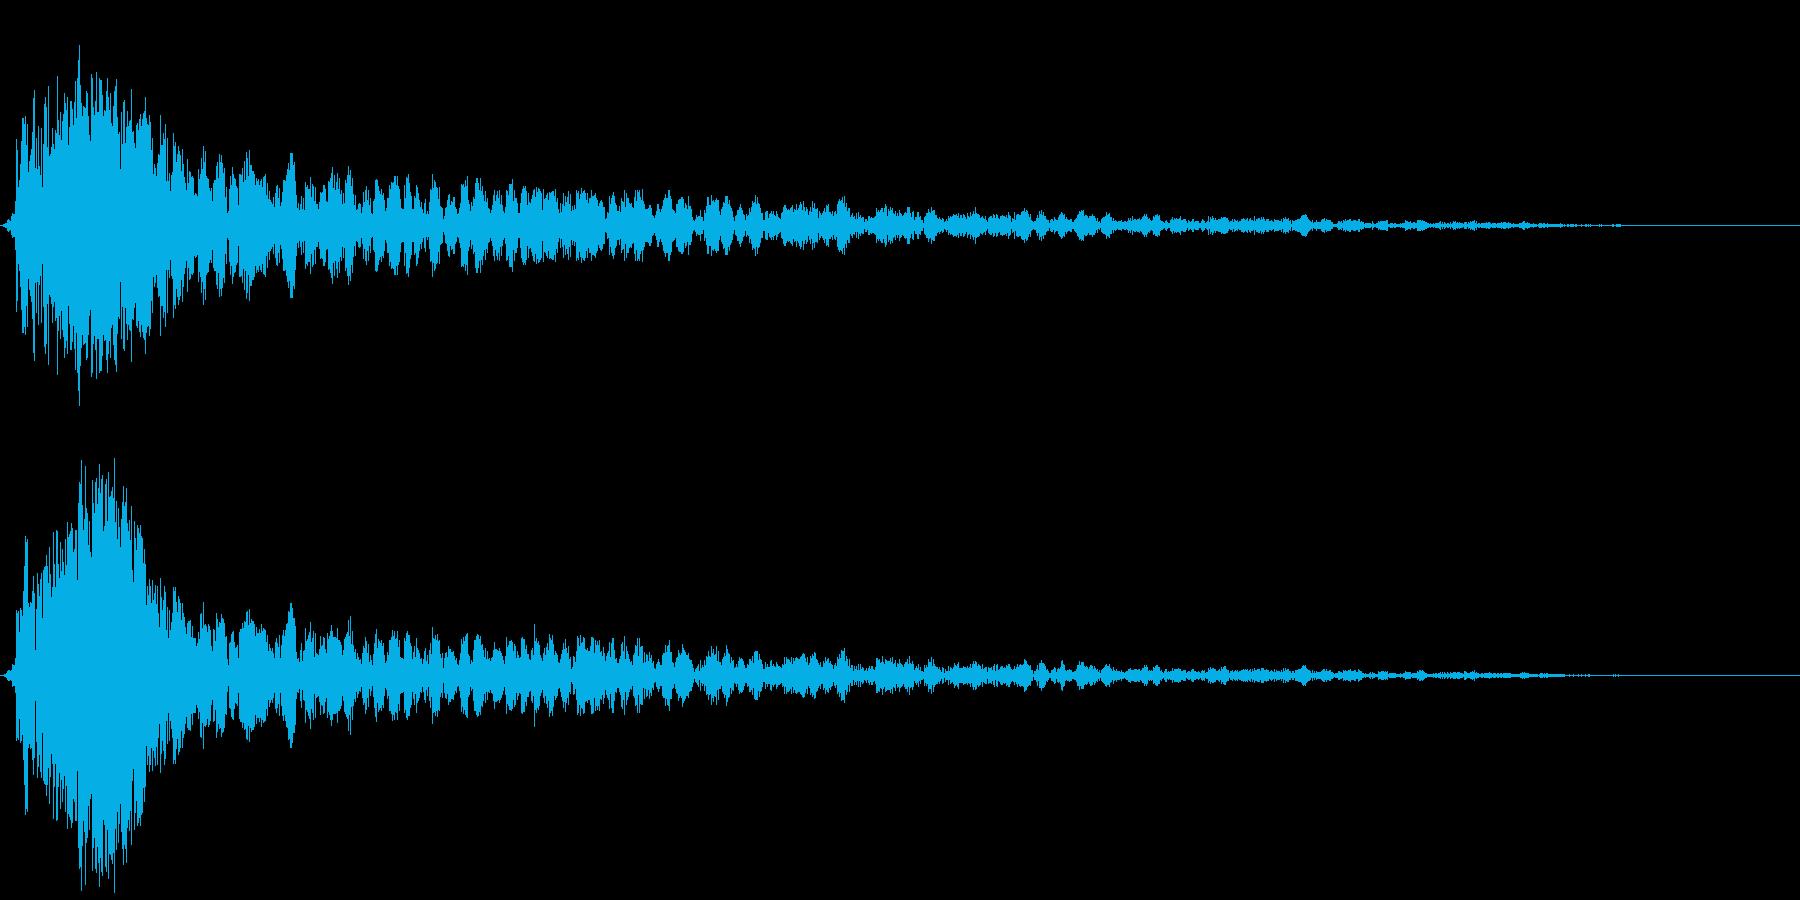 【SF映画】ブワーンッッッ・・・の再生済みの波形